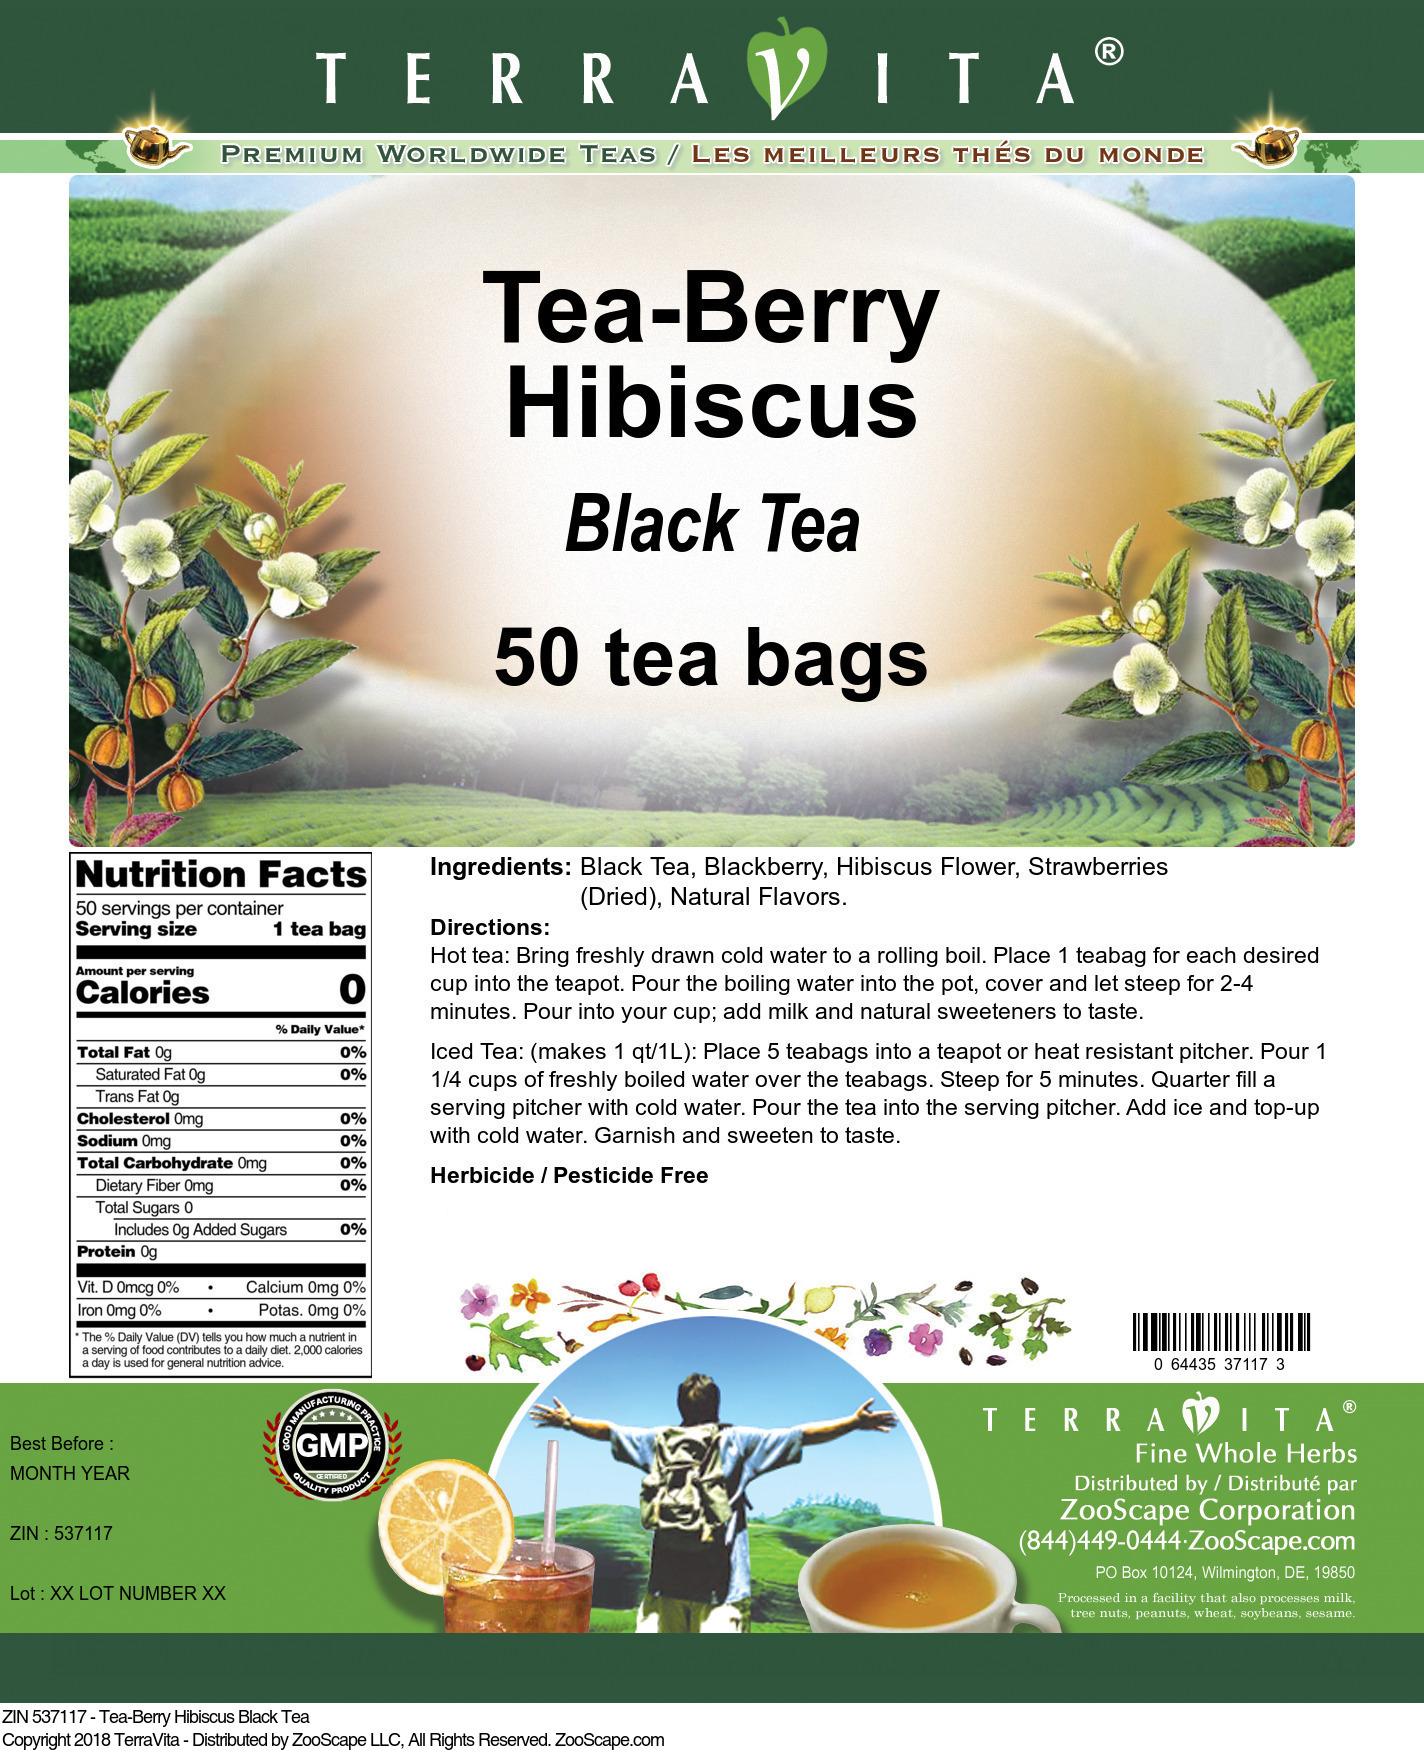 Tea-Berry Hibiscus Black Tea